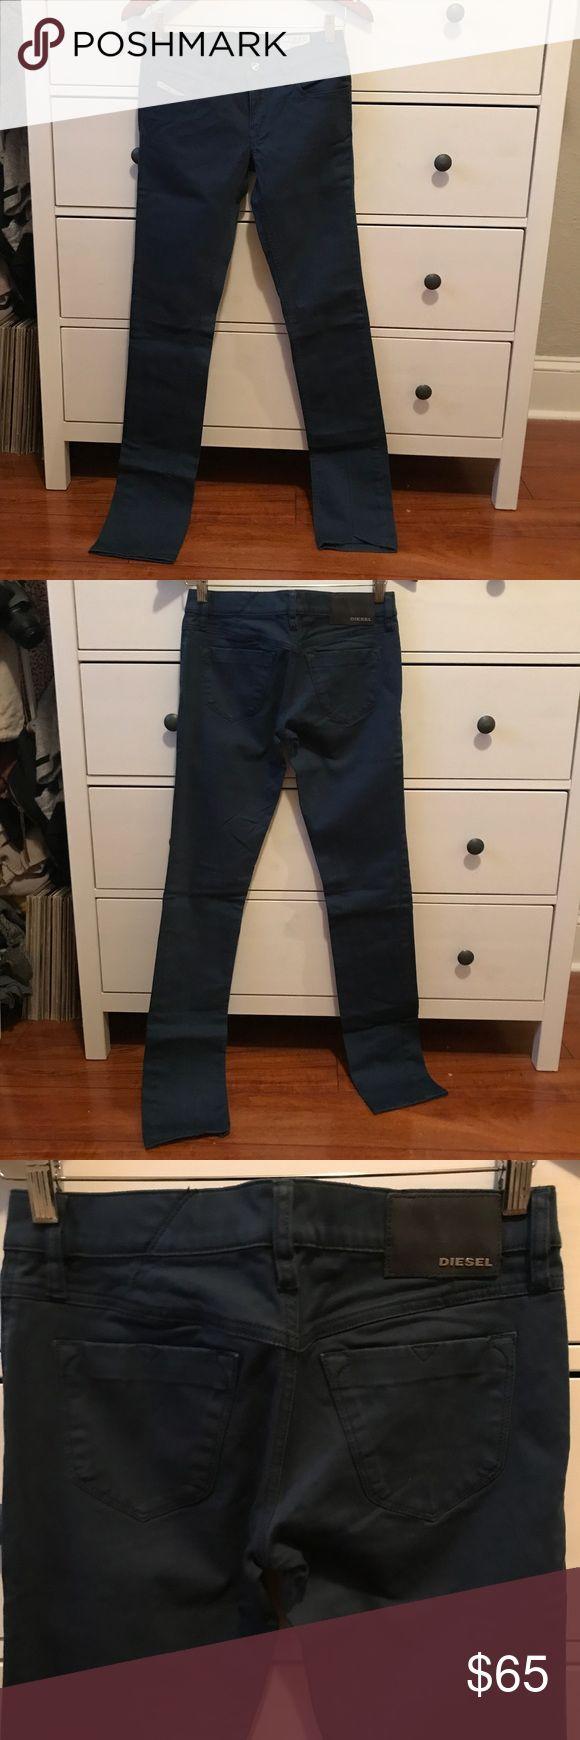 Indigo Diesel Pants Mid rise skinnies! Literally wore them once. Great material and very comfy. Diesel Pants Skinny